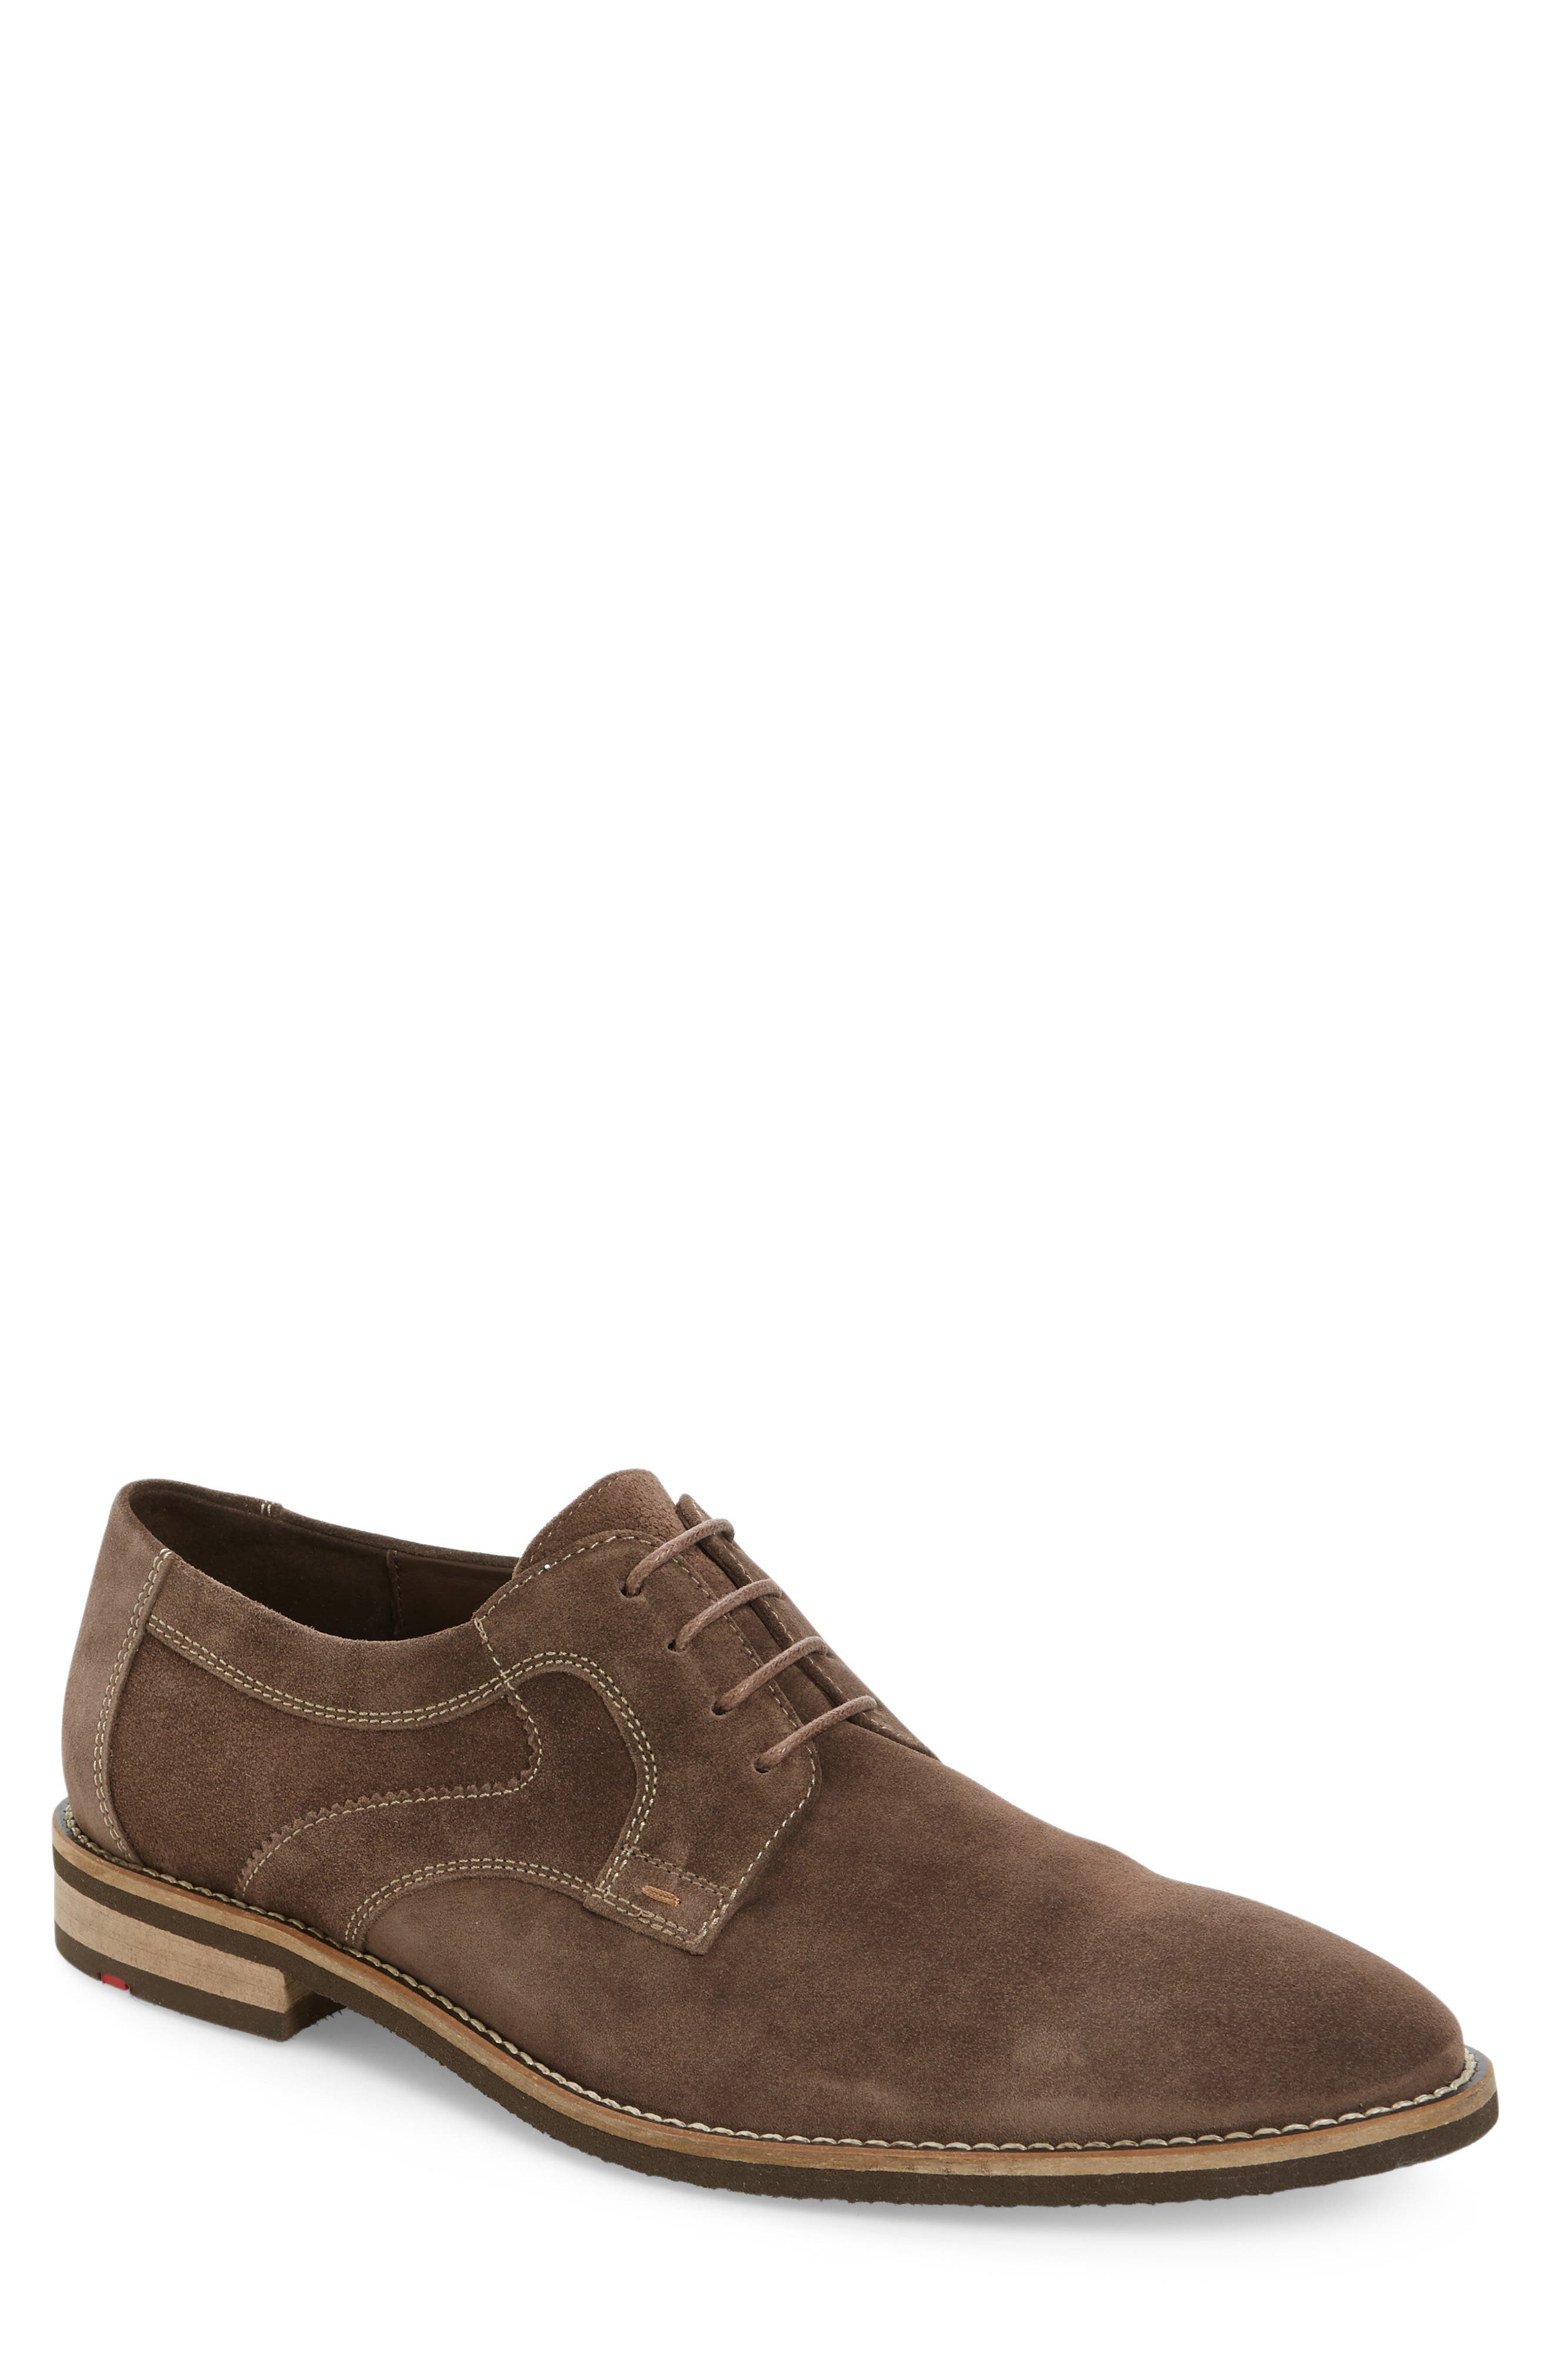 Alternate Image 1 Selected - Lloyd Haarlem Buck Shoe (Men)